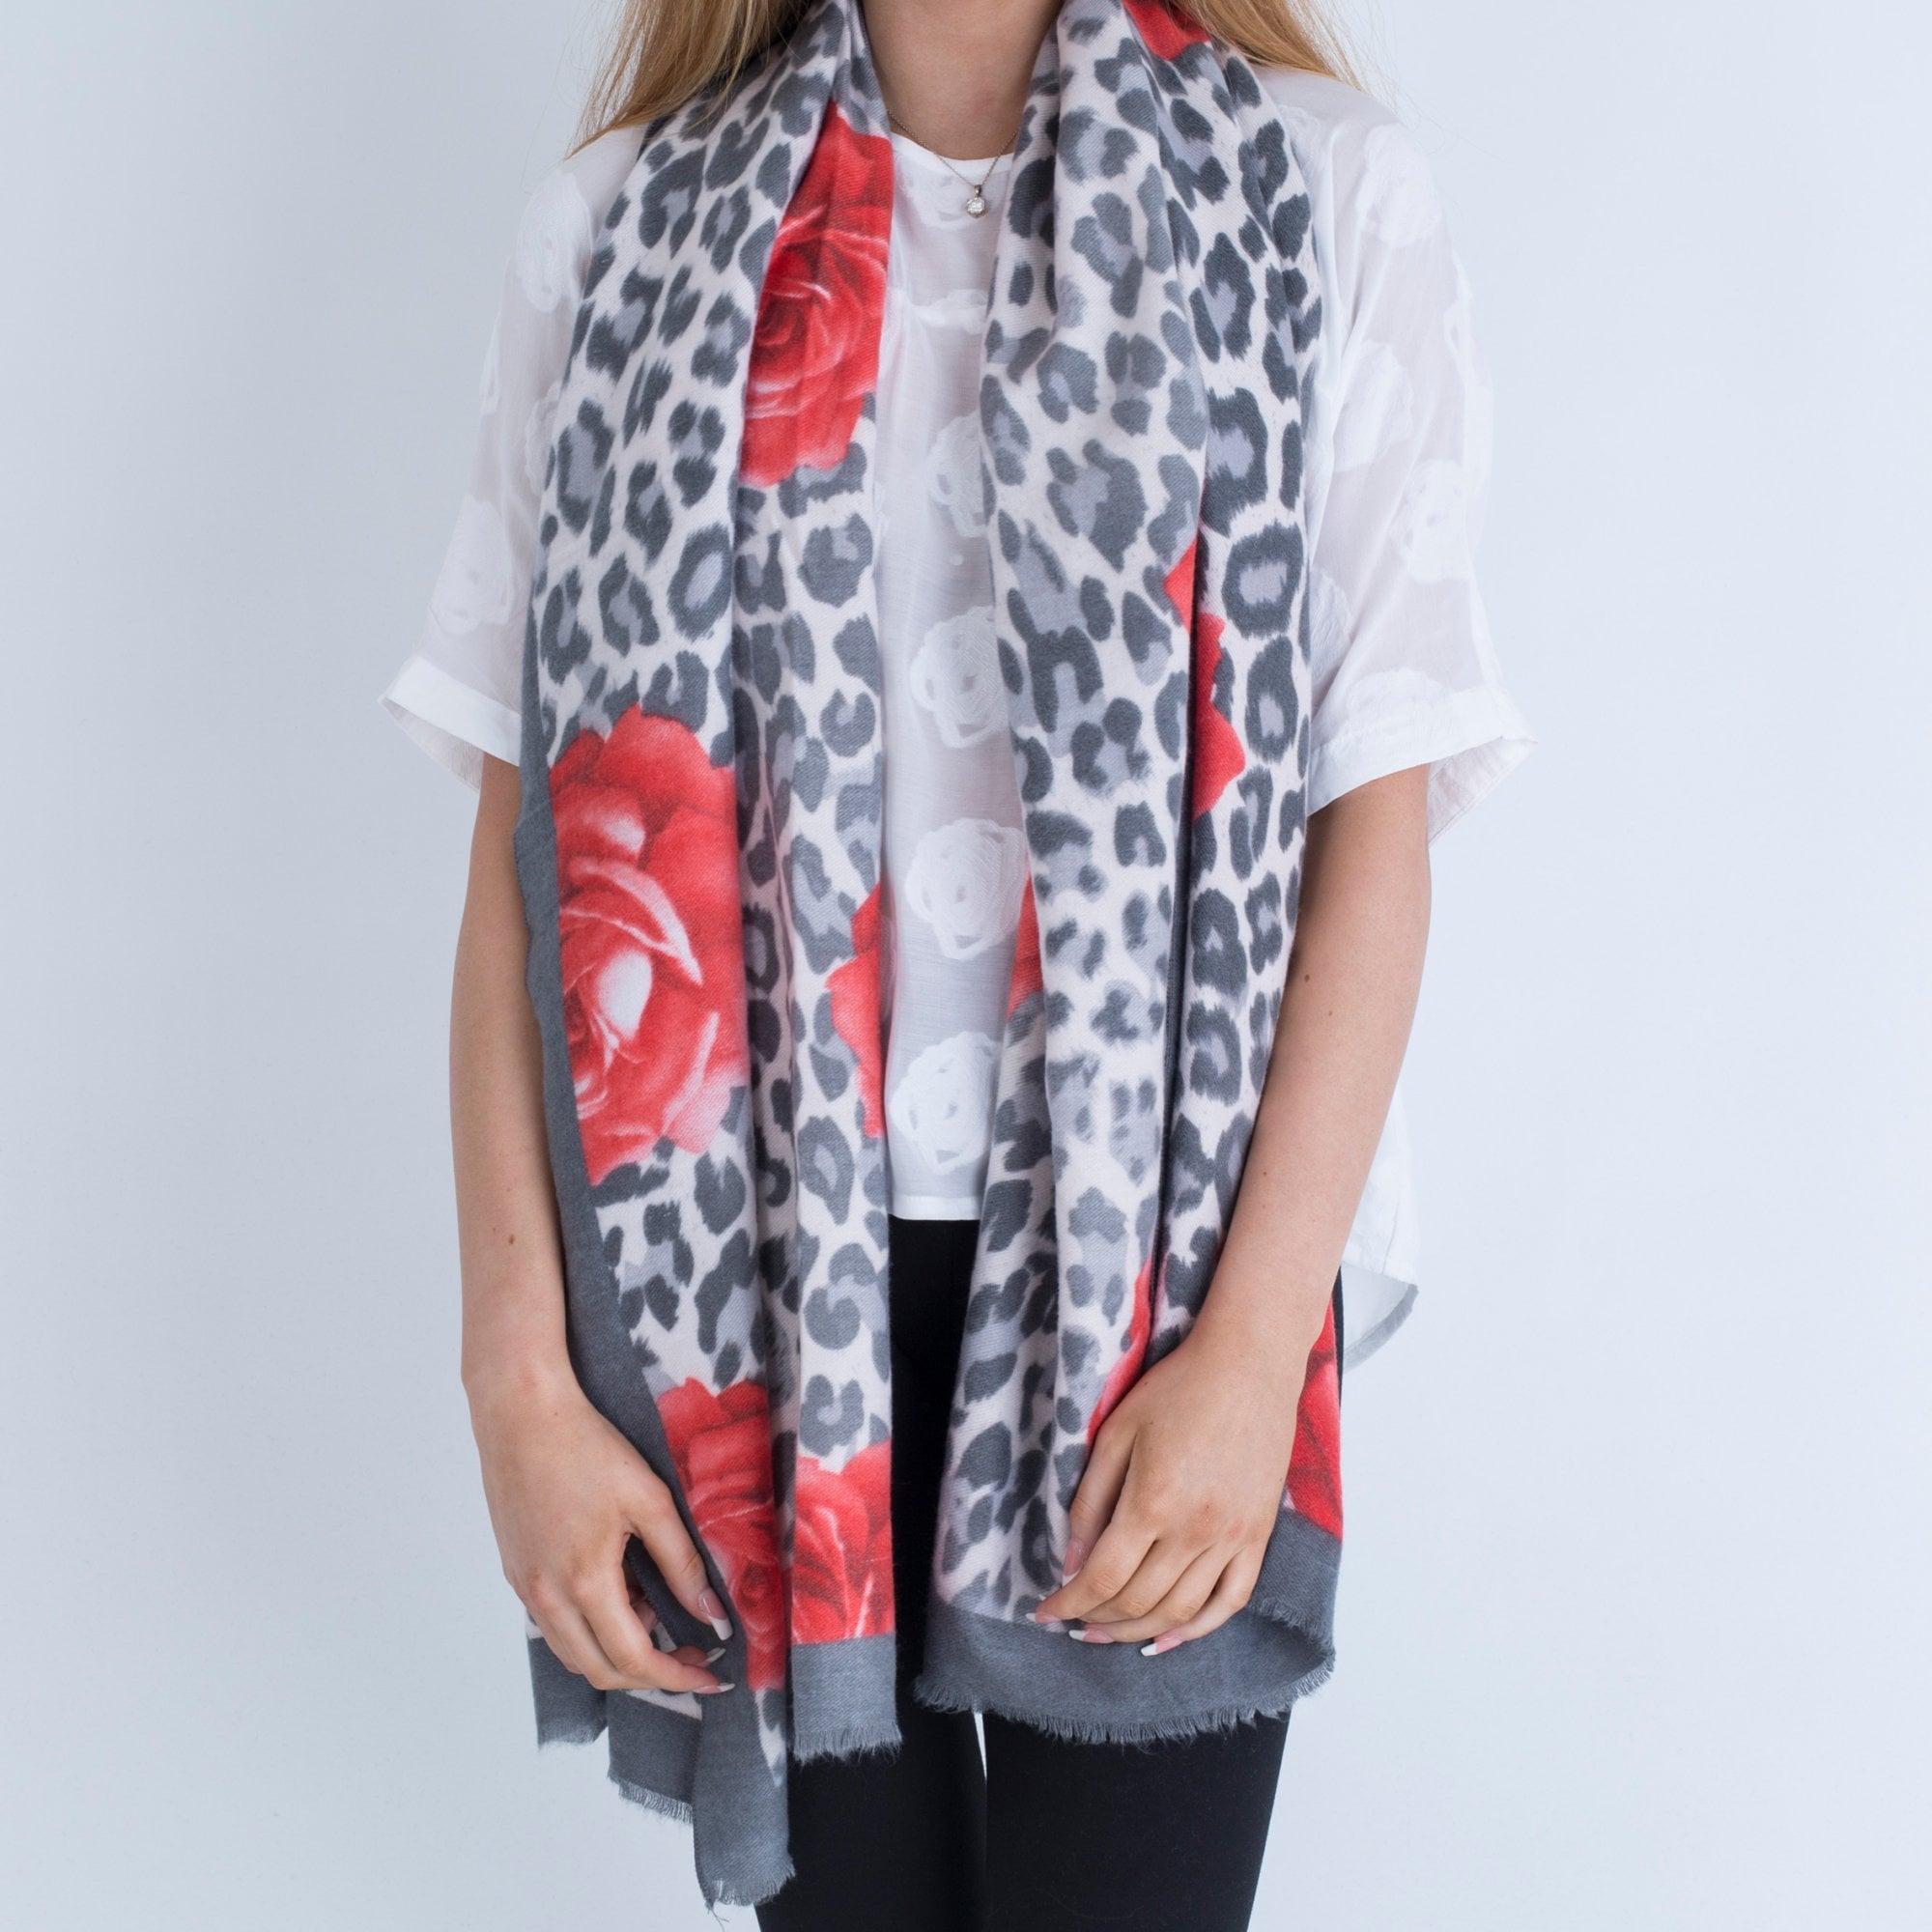 Park Lane Leopard And Rose Print Pashmina Grey